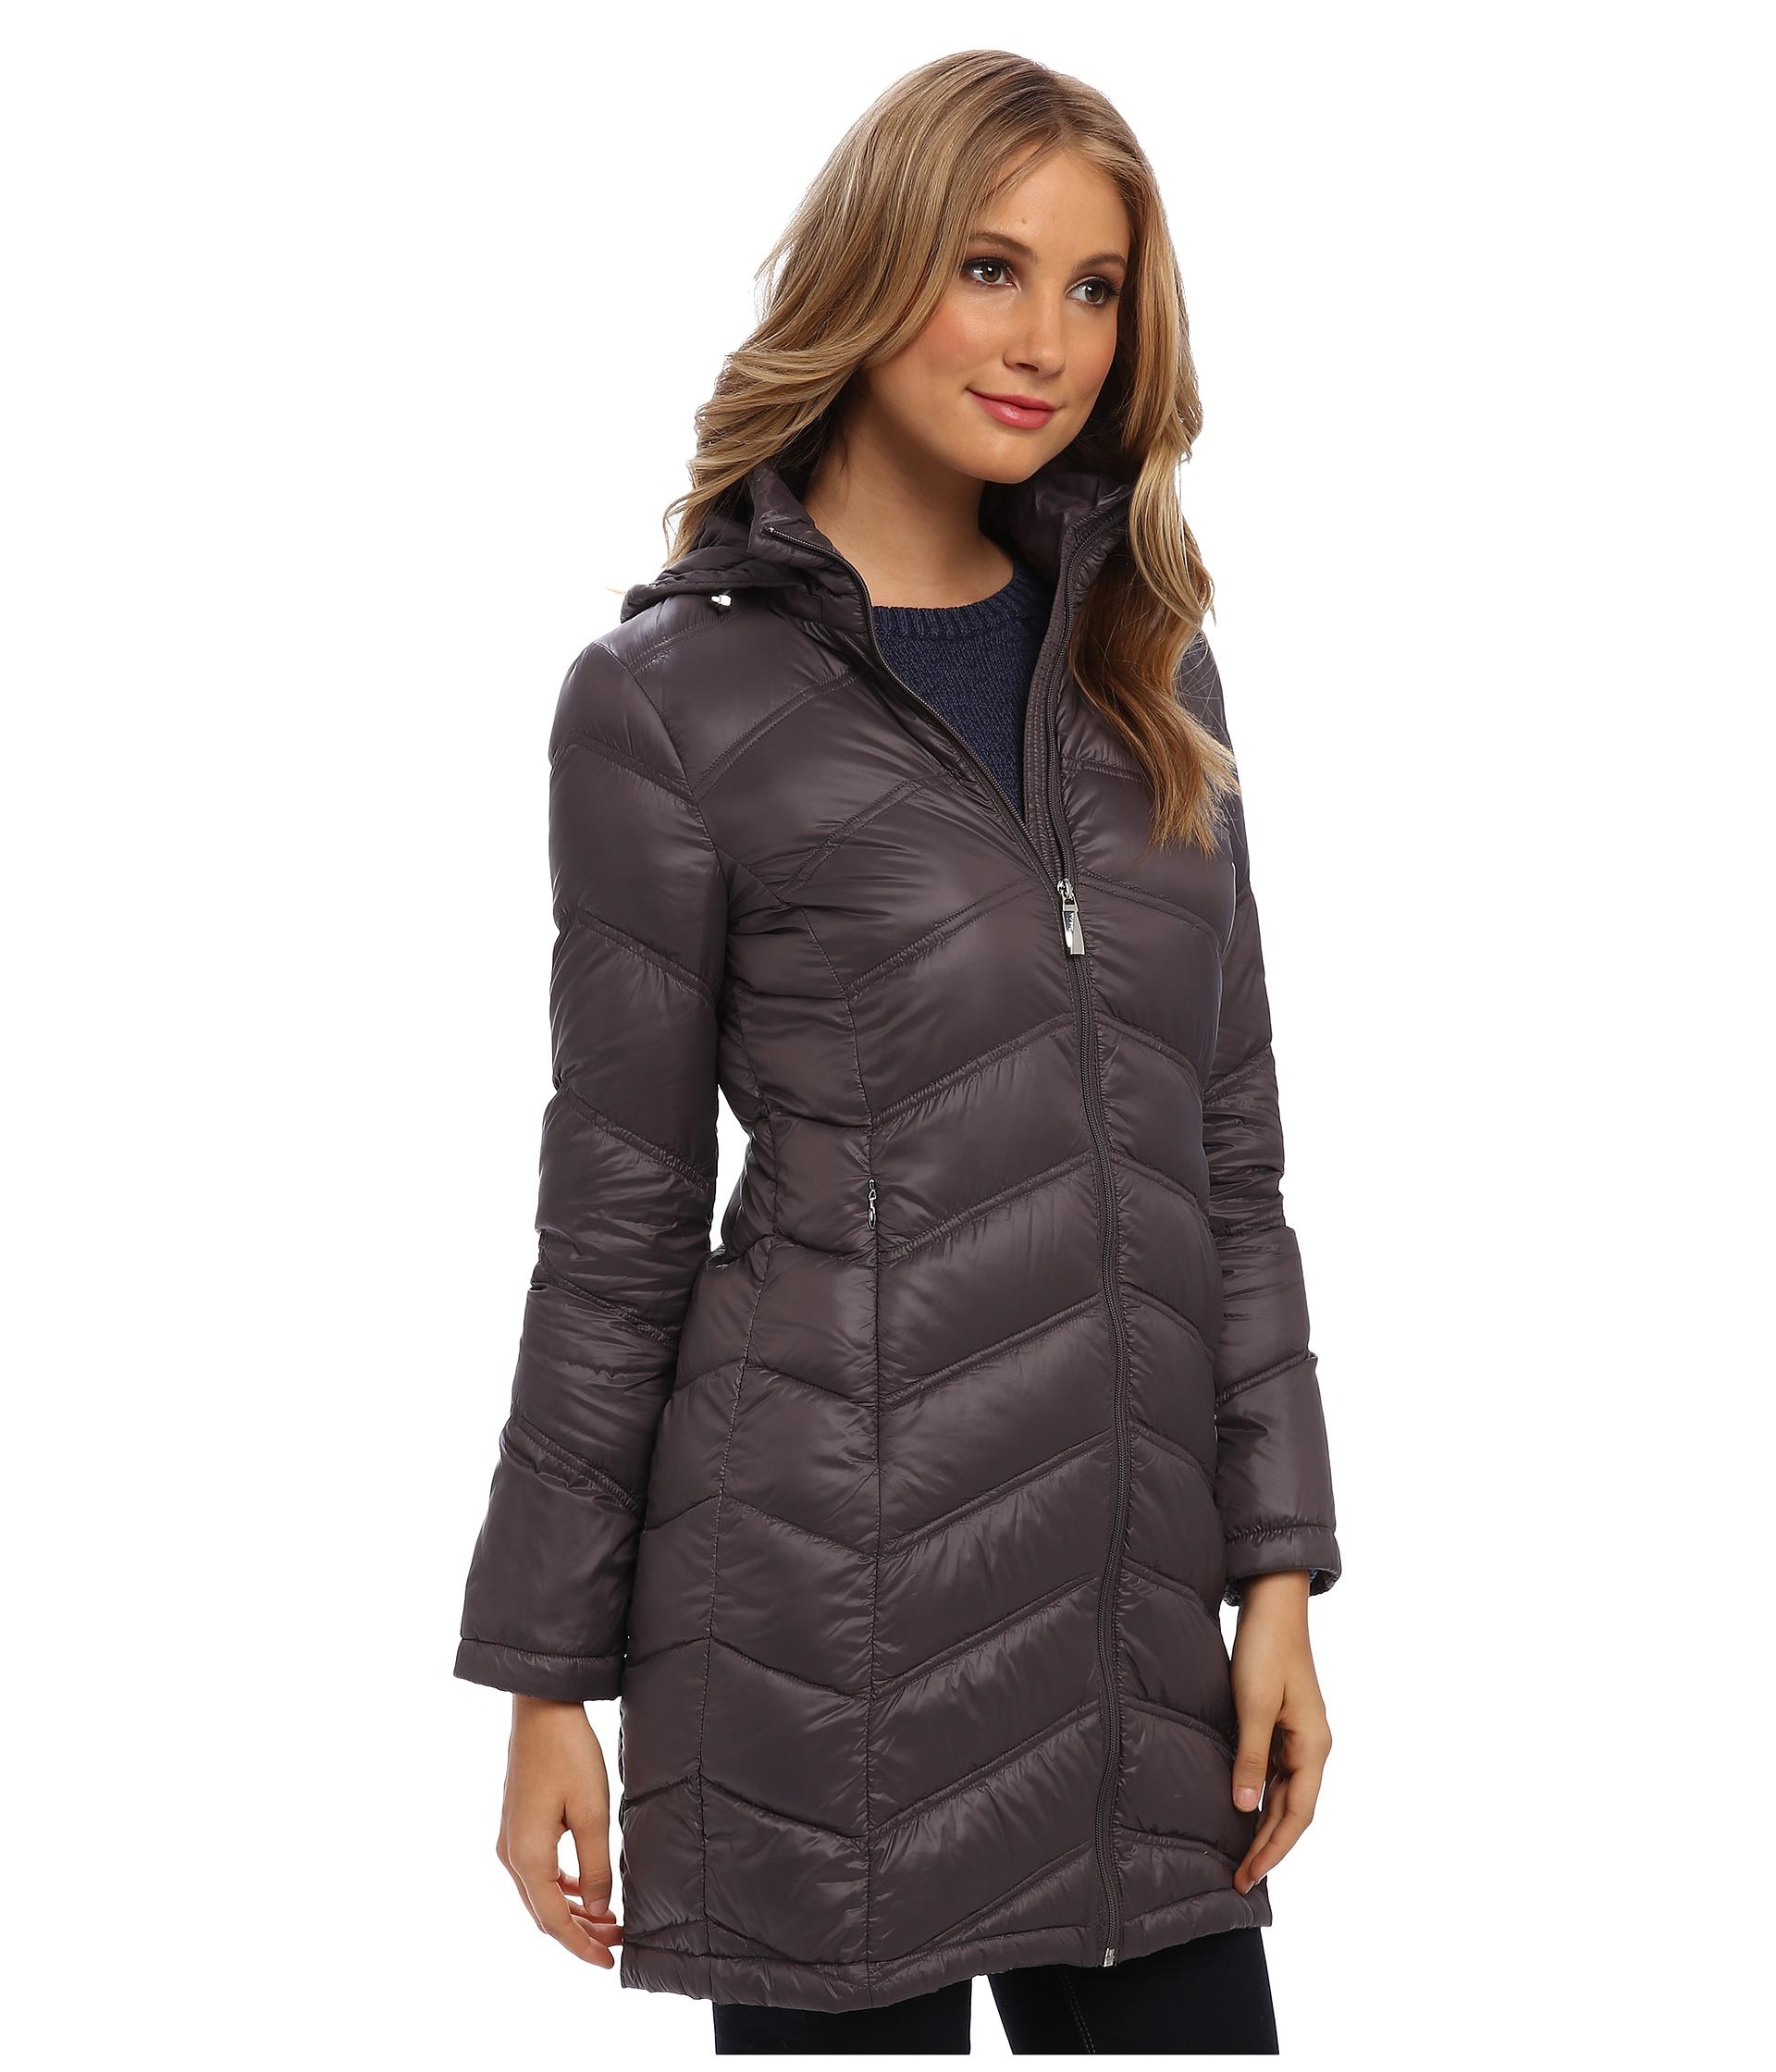 Calvin klein zipfront long nylon packable down jacket shipped free